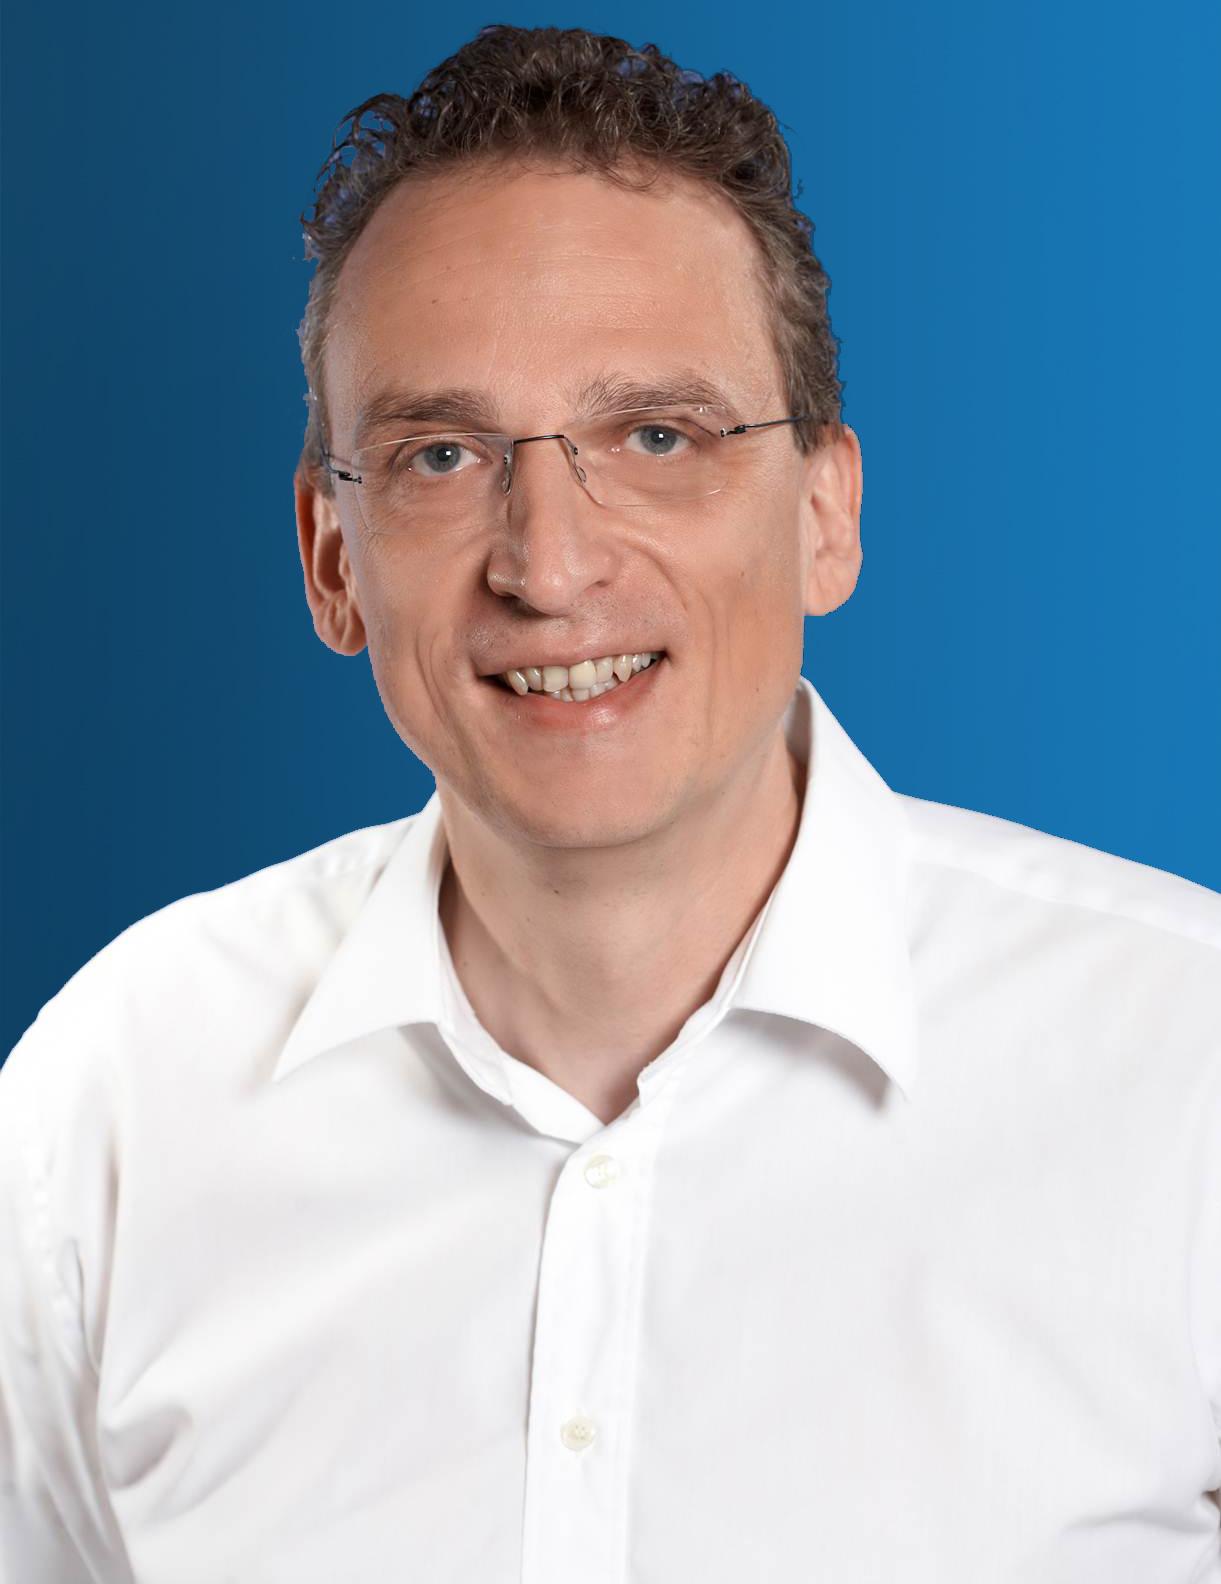 Dr. Rainer Pollak